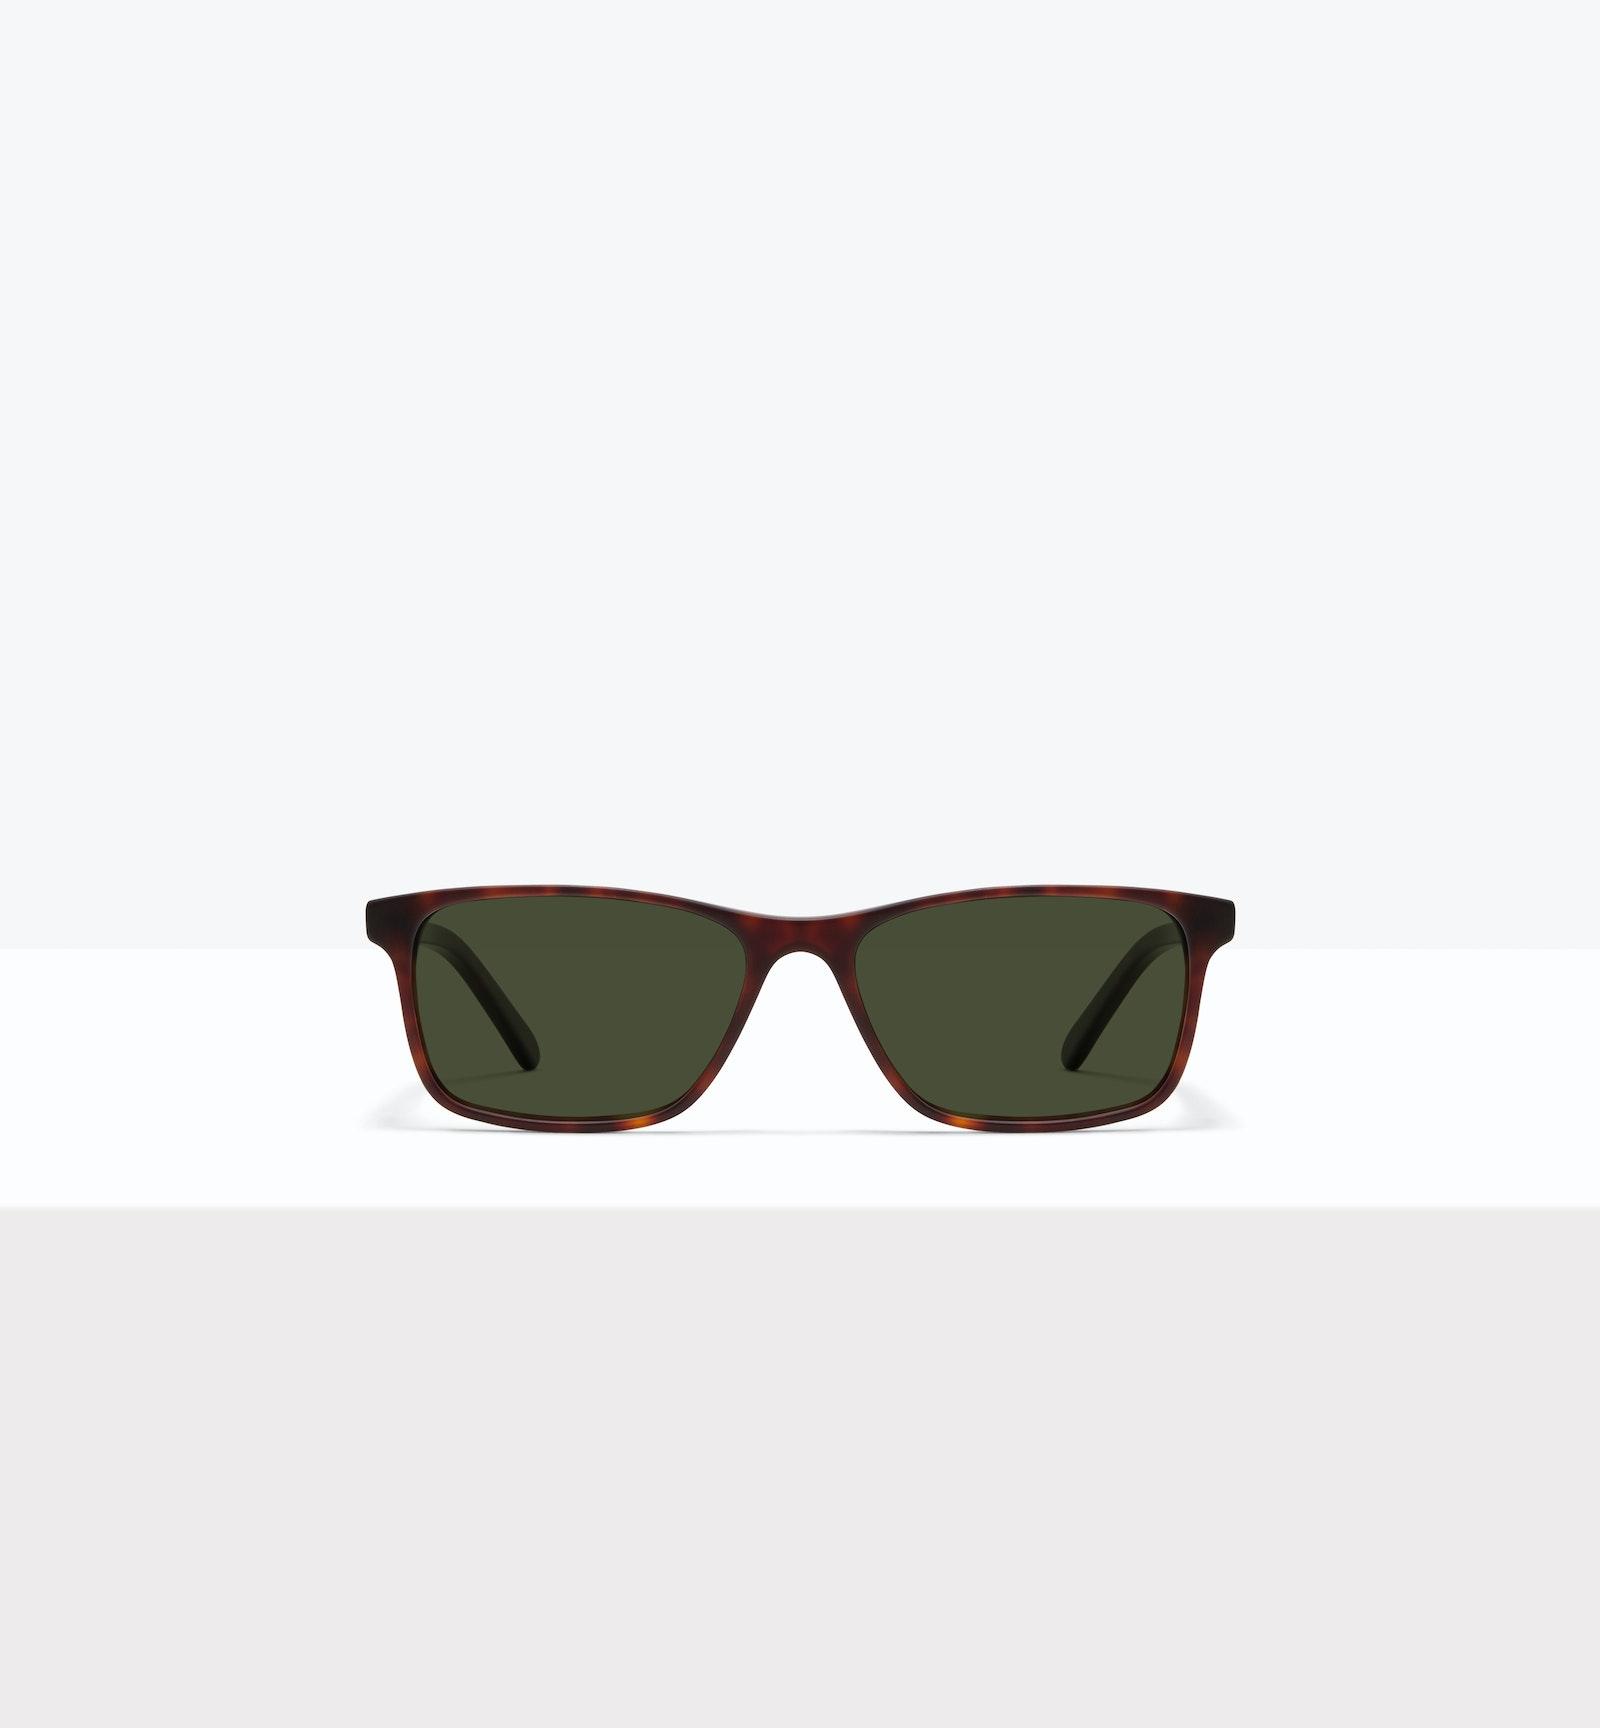 Affordable Fashion Glasses Rectangle Sunglasses Men Henri XL Matte Tort